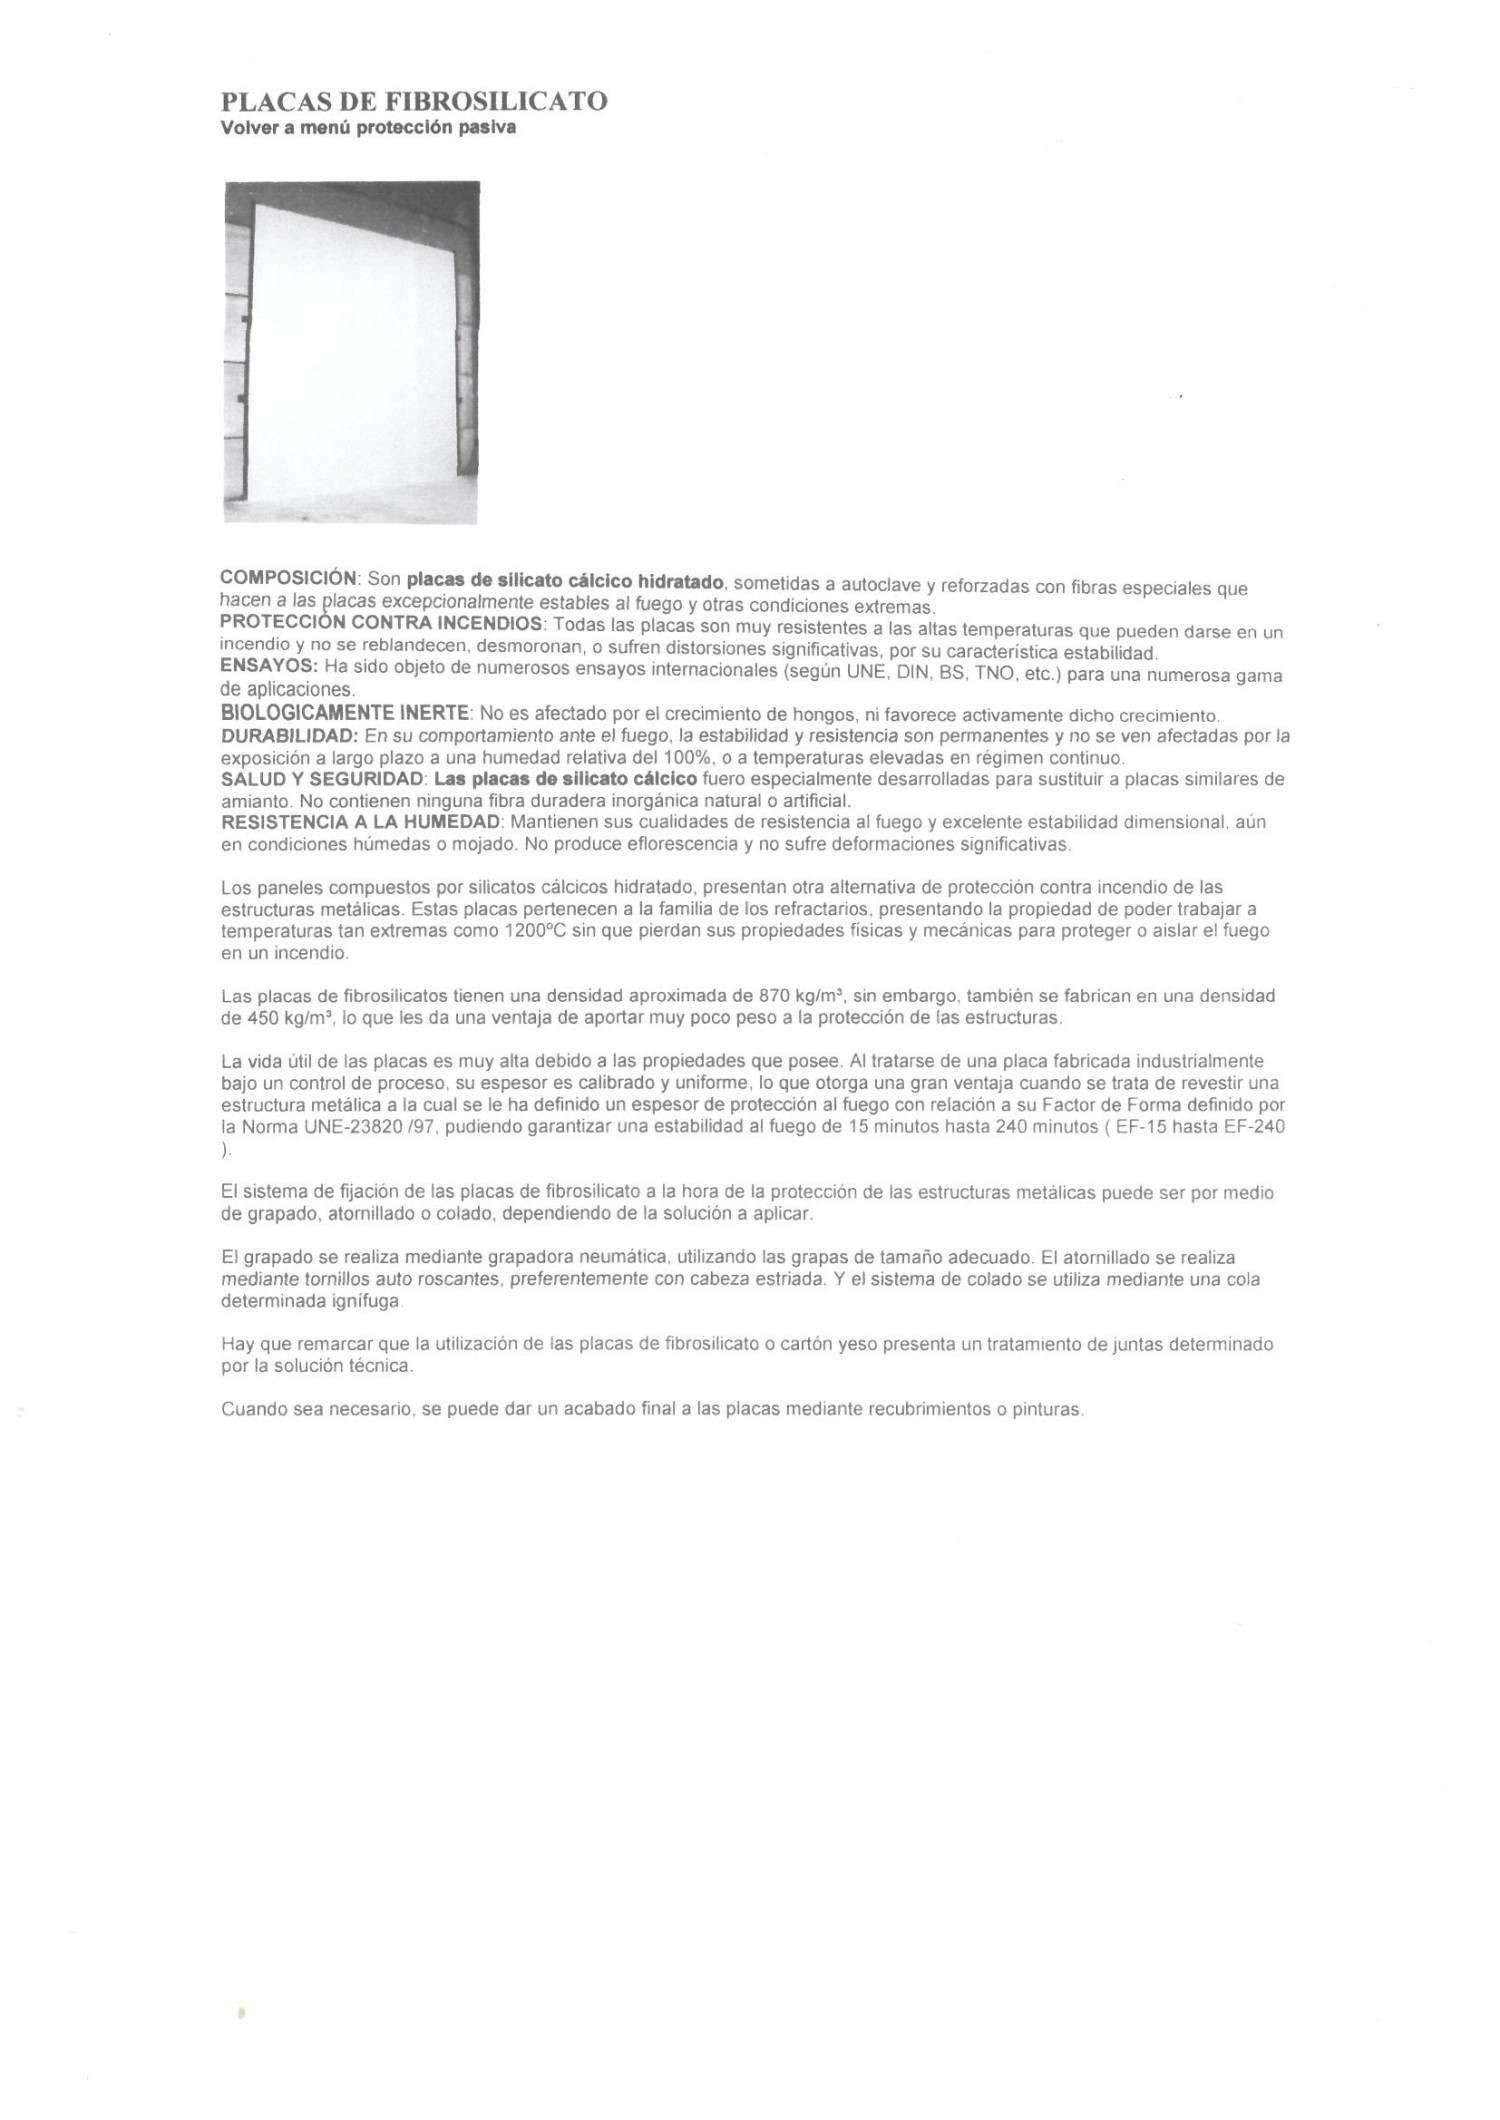 Grupo Solamaza placas de fibrosilicato